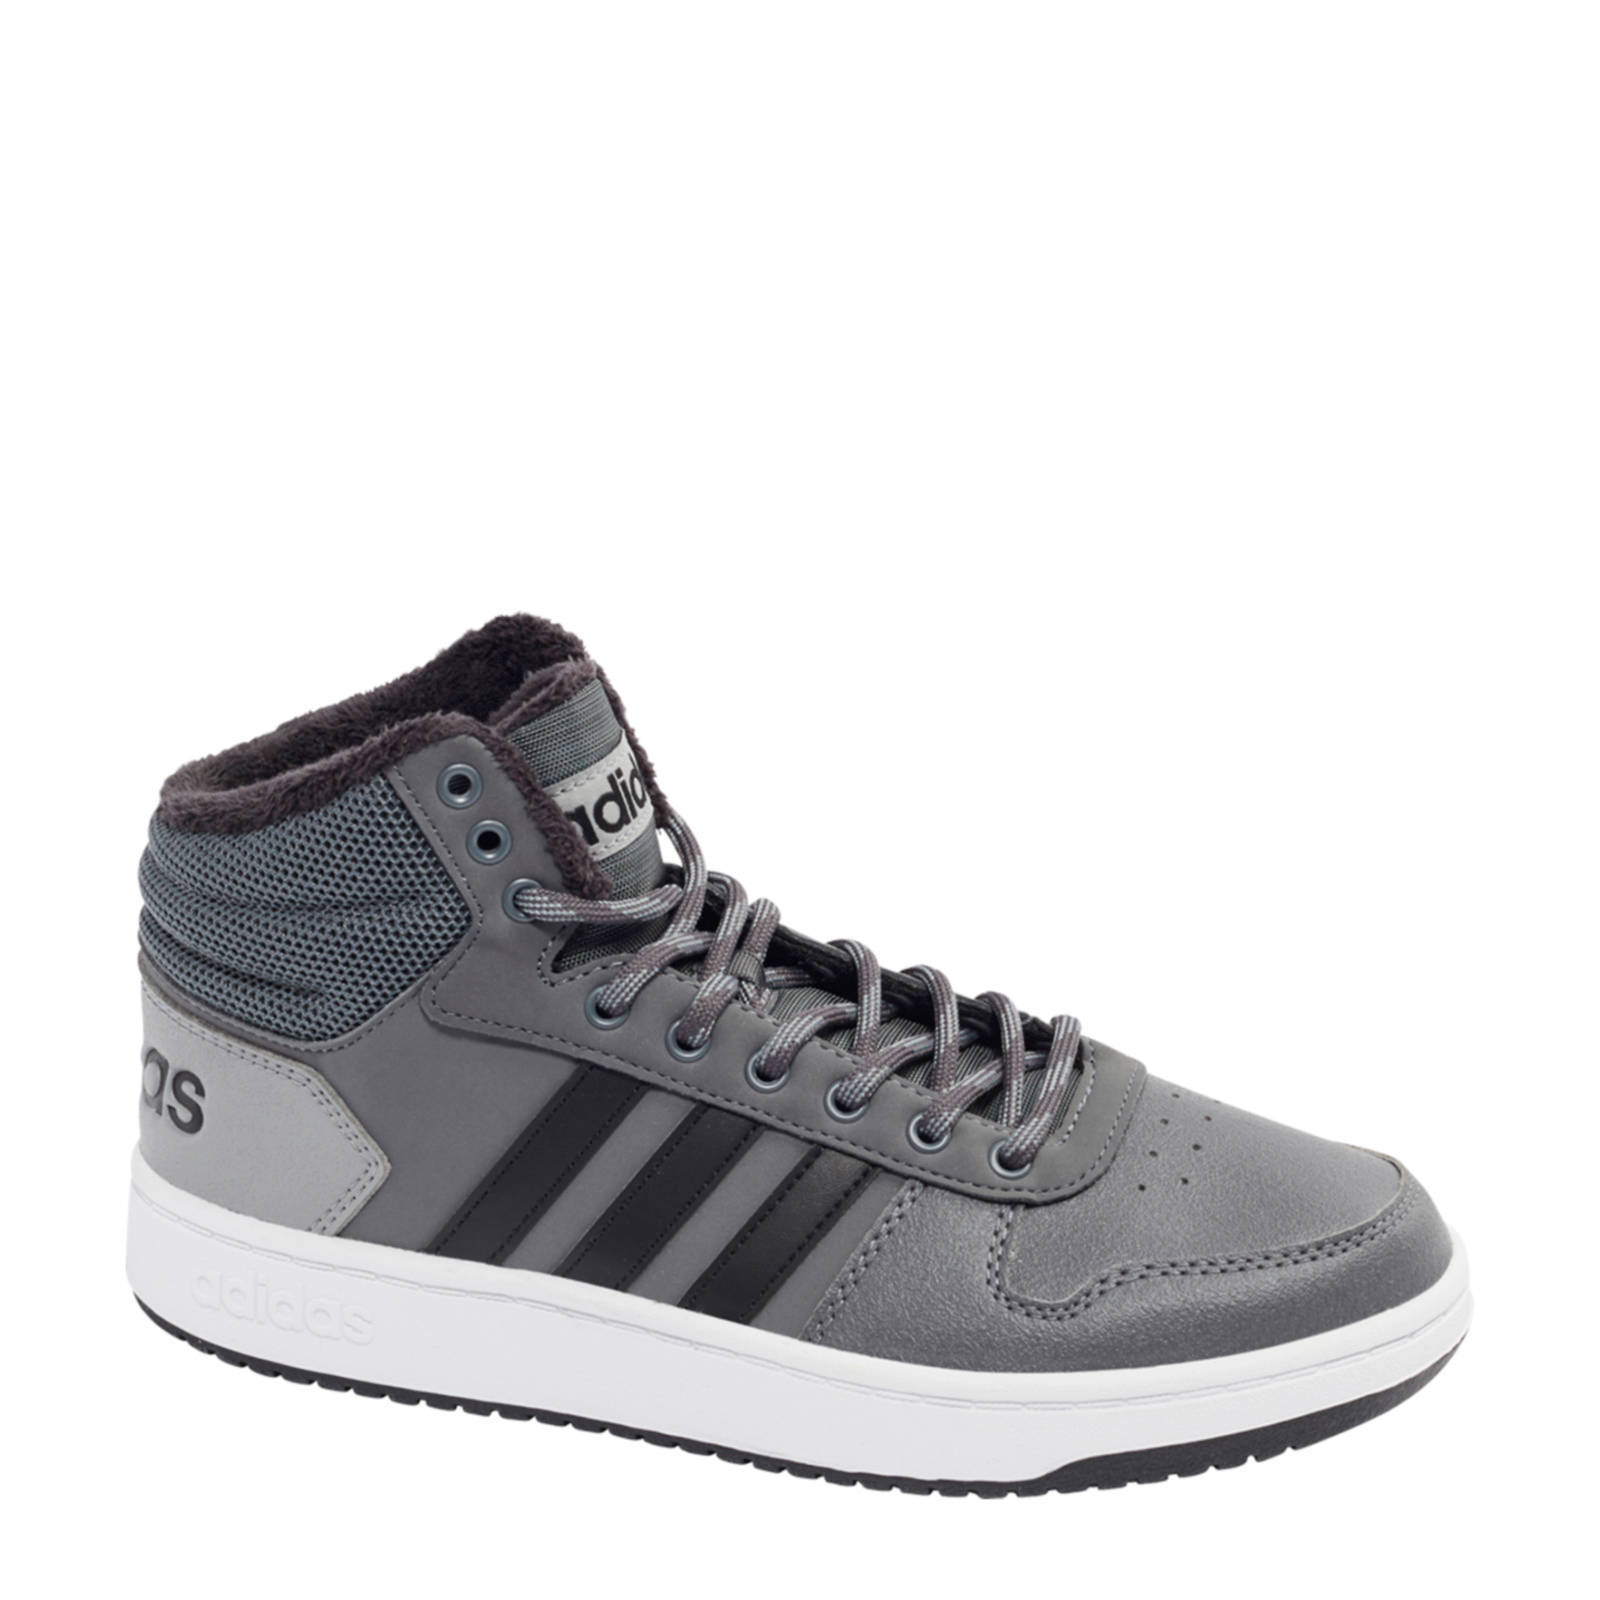 Hoops Mid 2.0 hoge sneakers grijs